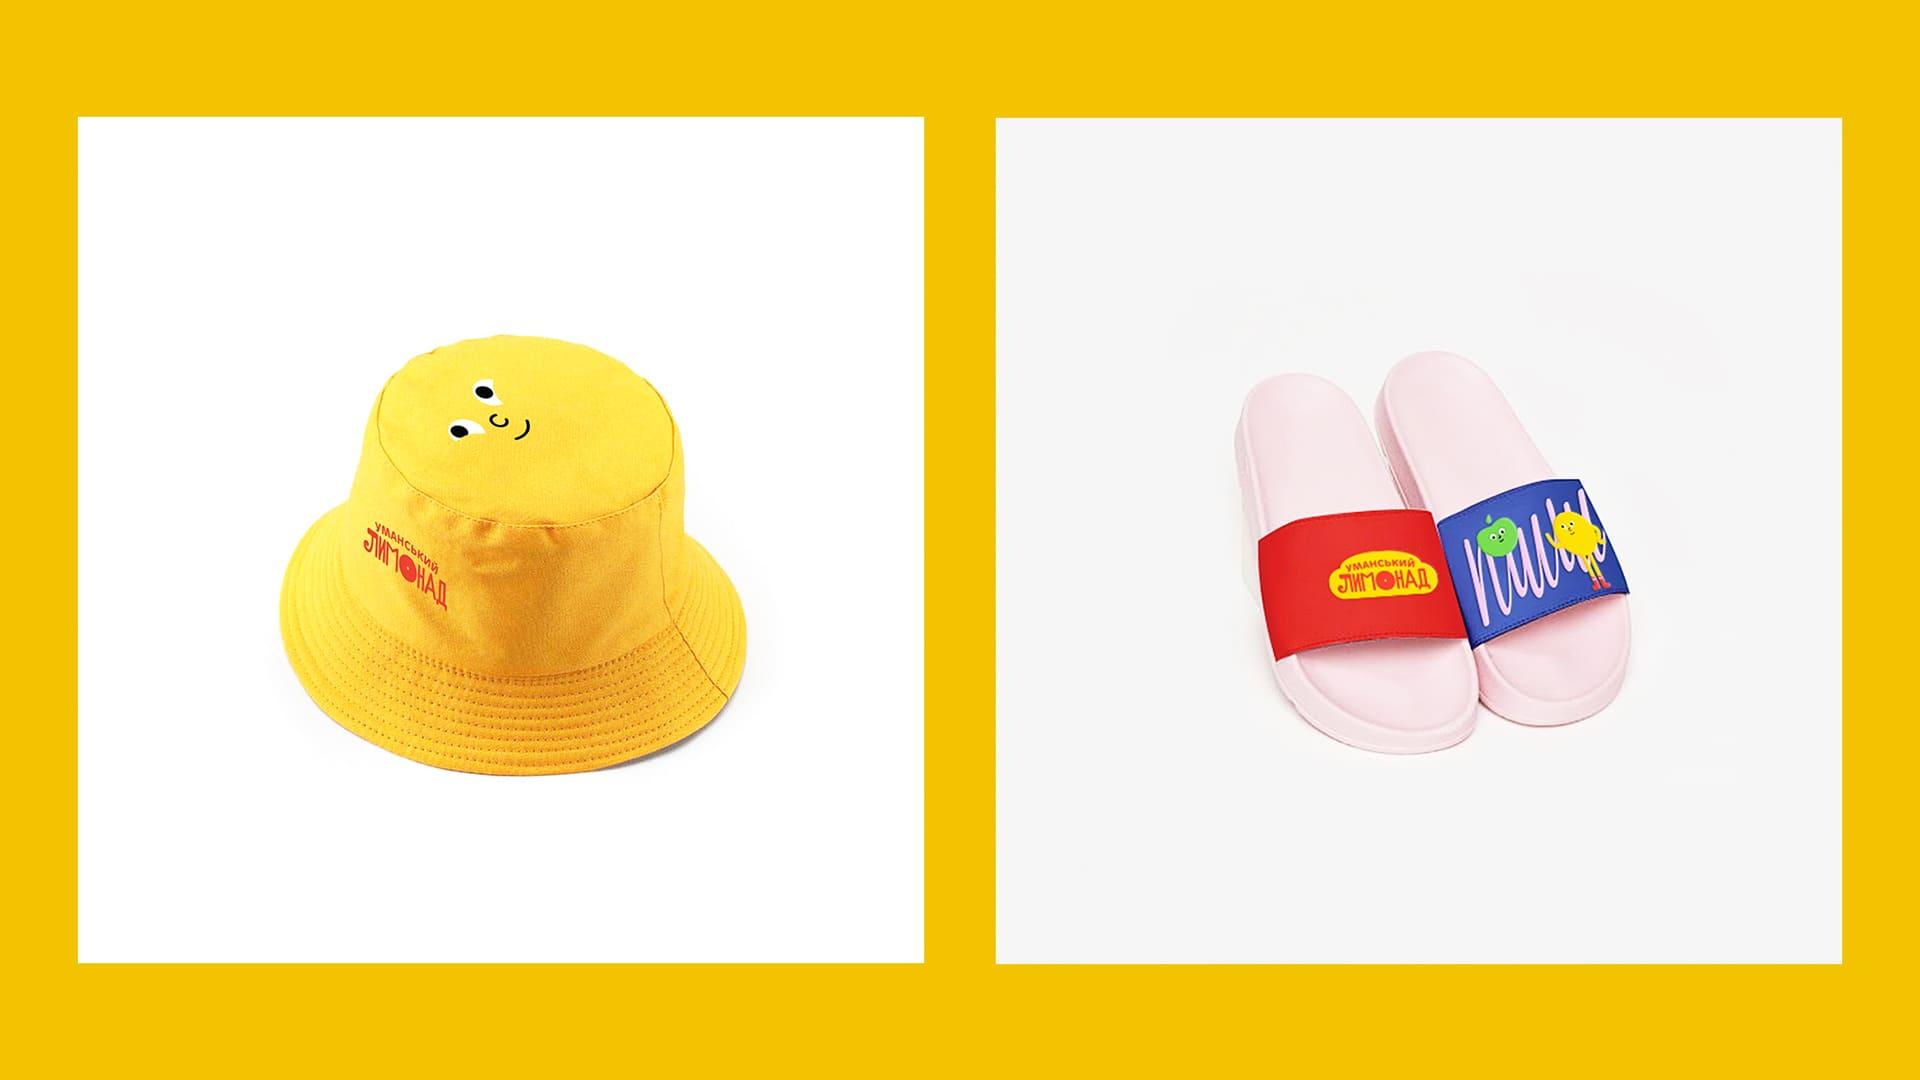 gra brand design umanpivo lemonade 19